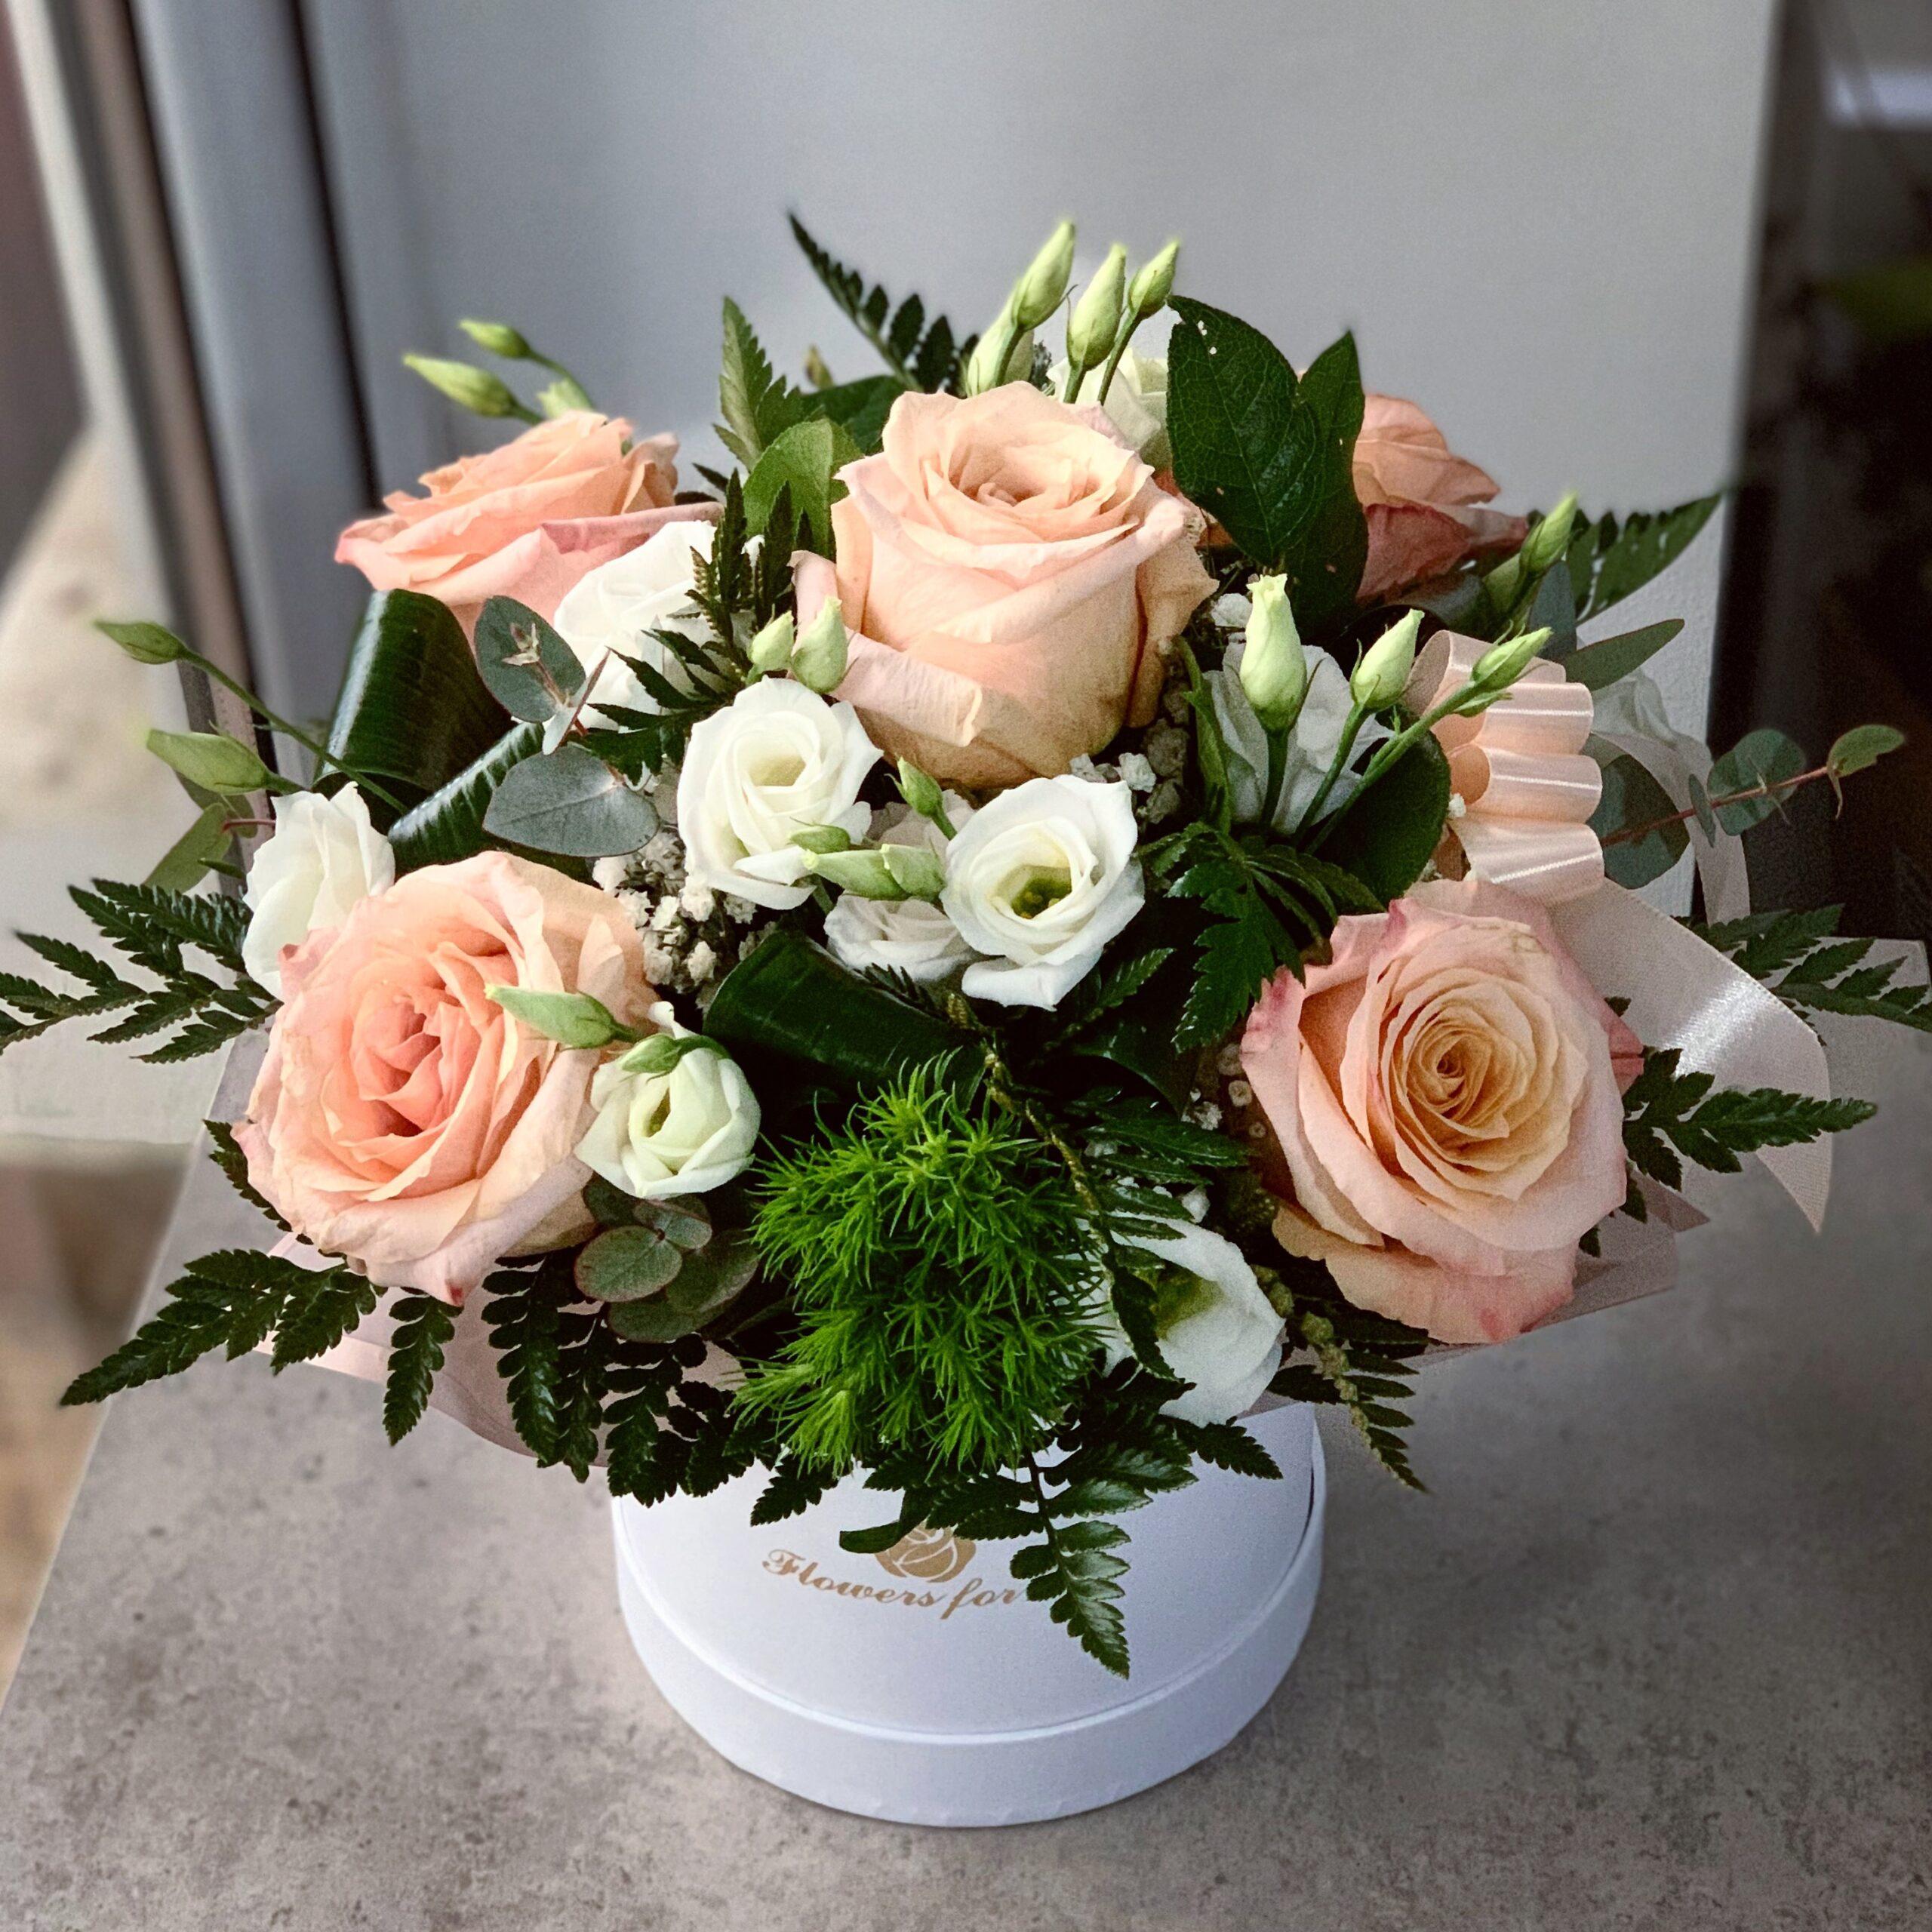 Aranjament cu Trandafiri Shimmer in Cutie Alba